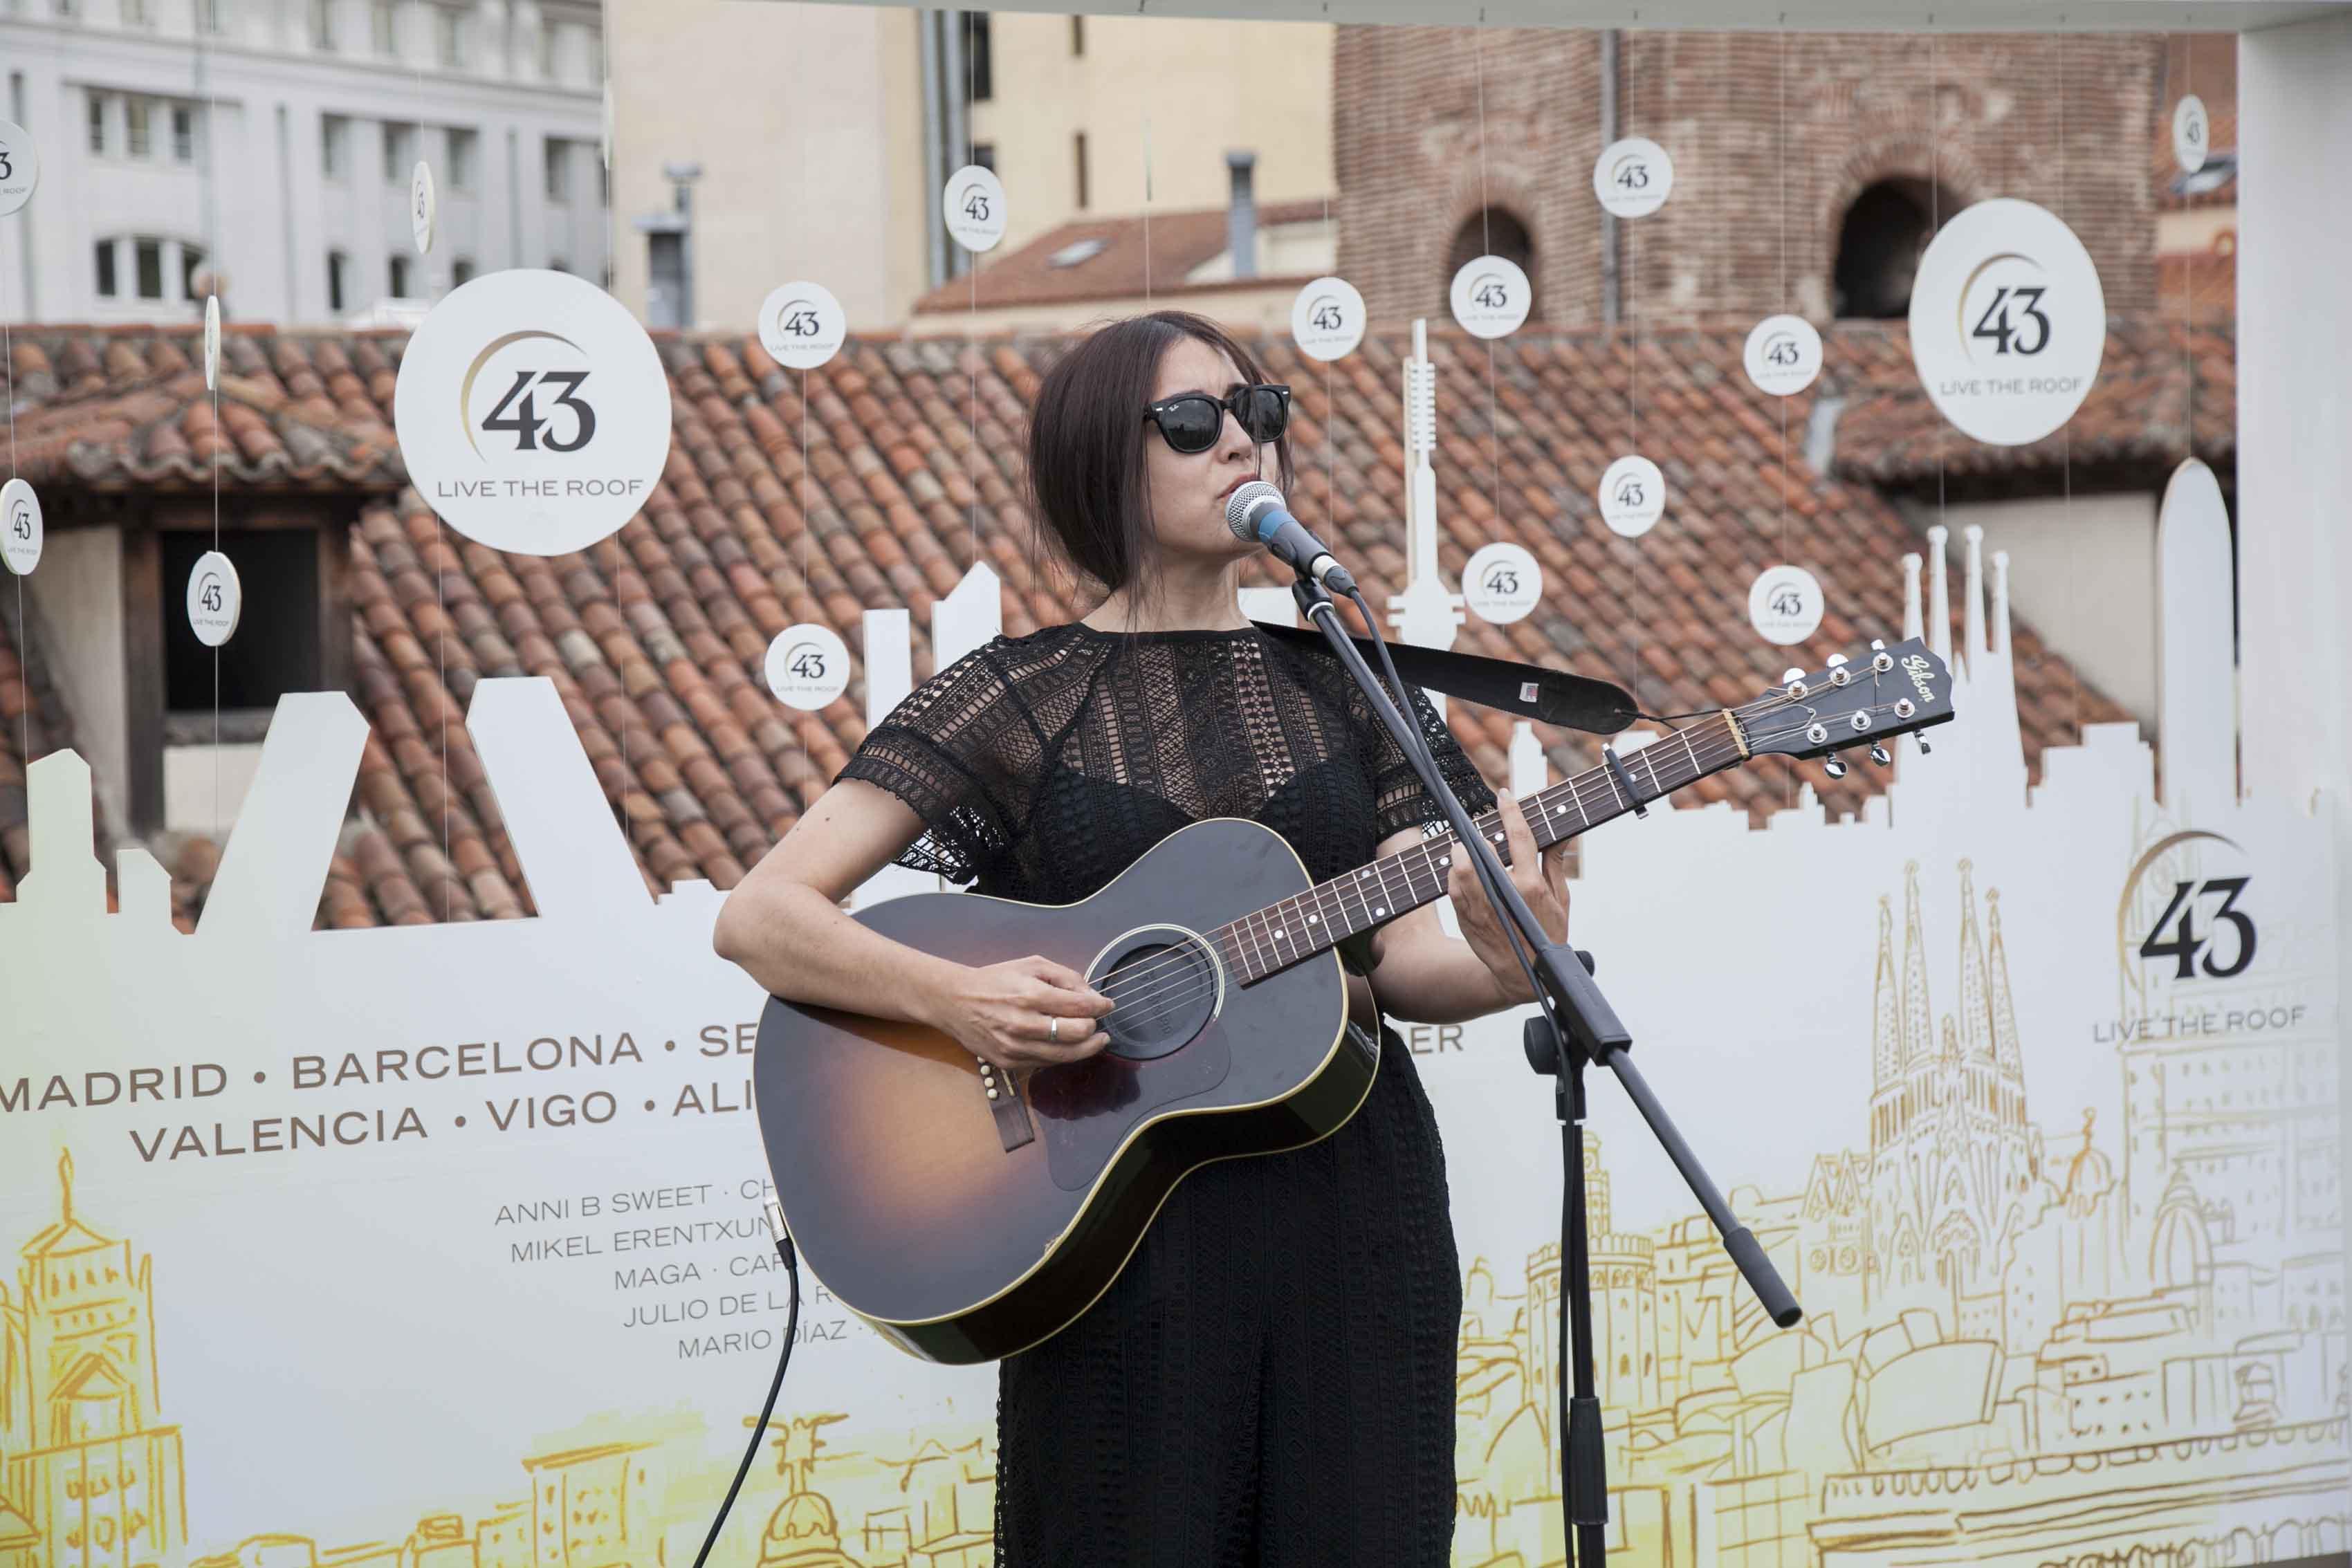 La elegancia de Anni BSweet llega a Valencia con 43 live the roof